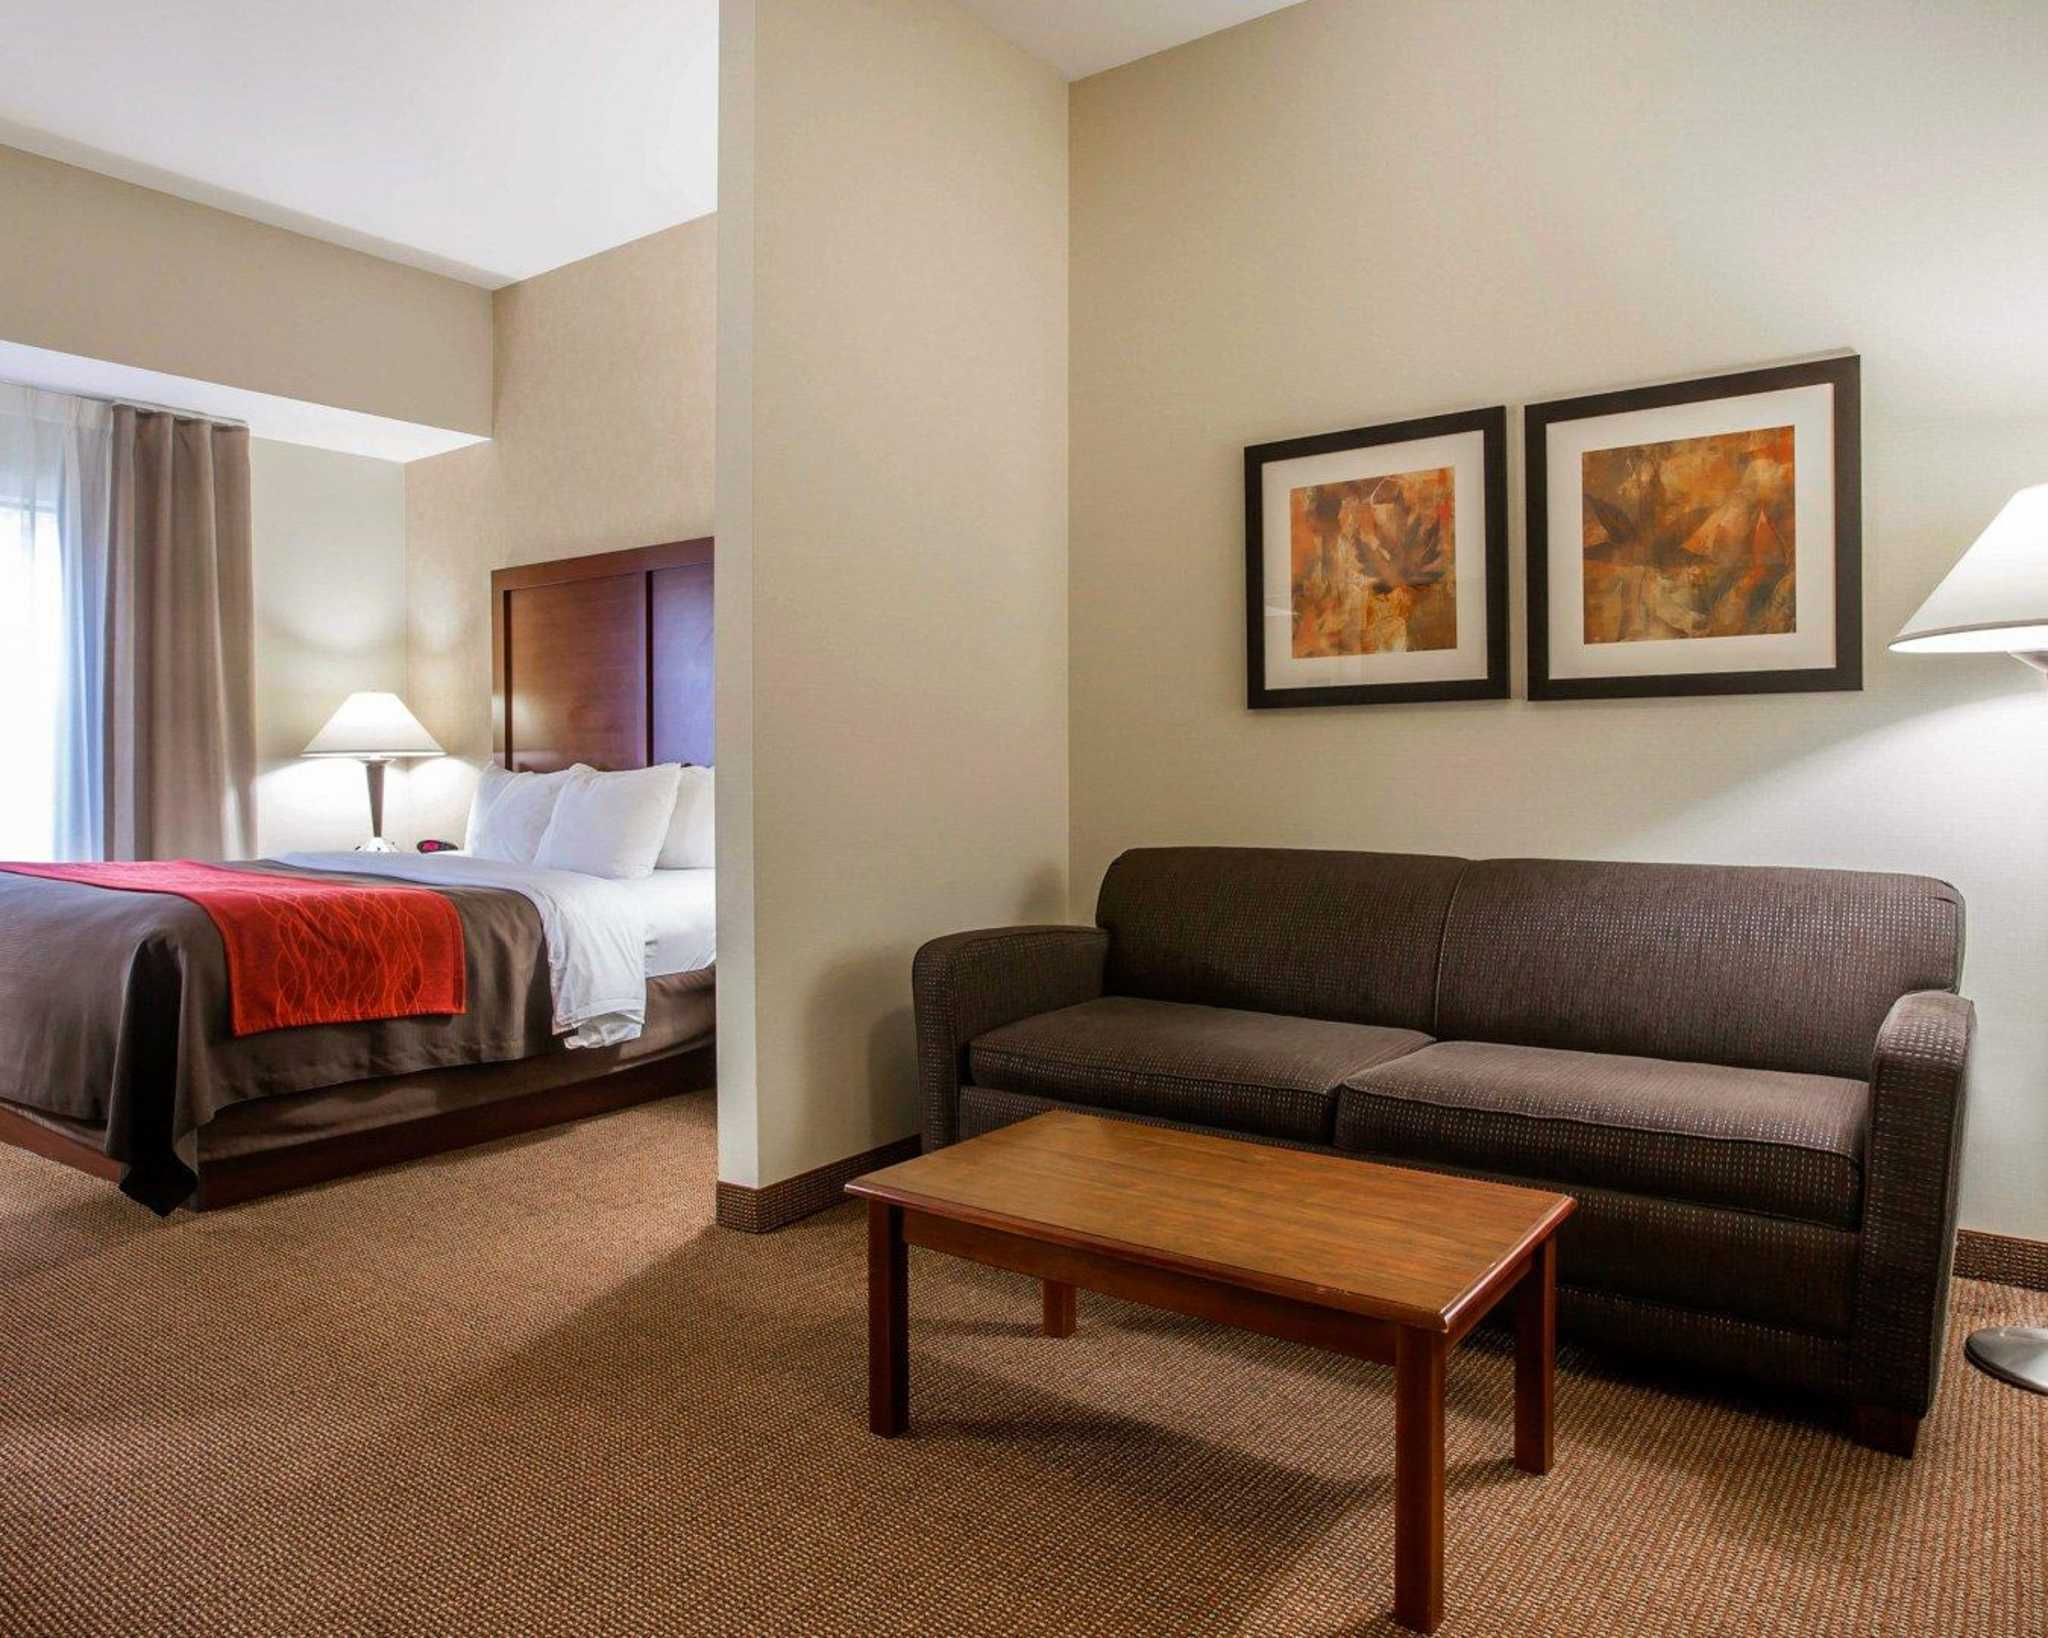 Comfort Inn & Suites adj to Akwesasne Mohawk Casino image 45